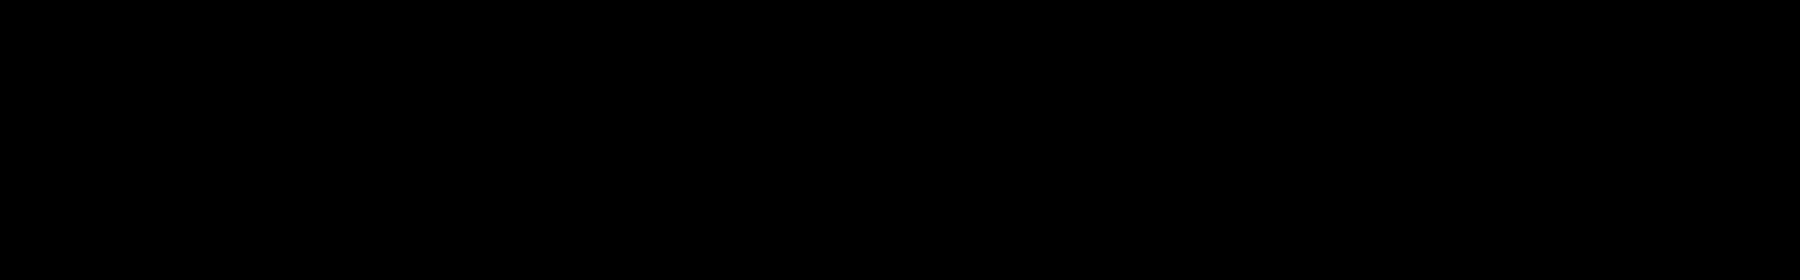 Black Swan - Omnisphere Bank audio waveform